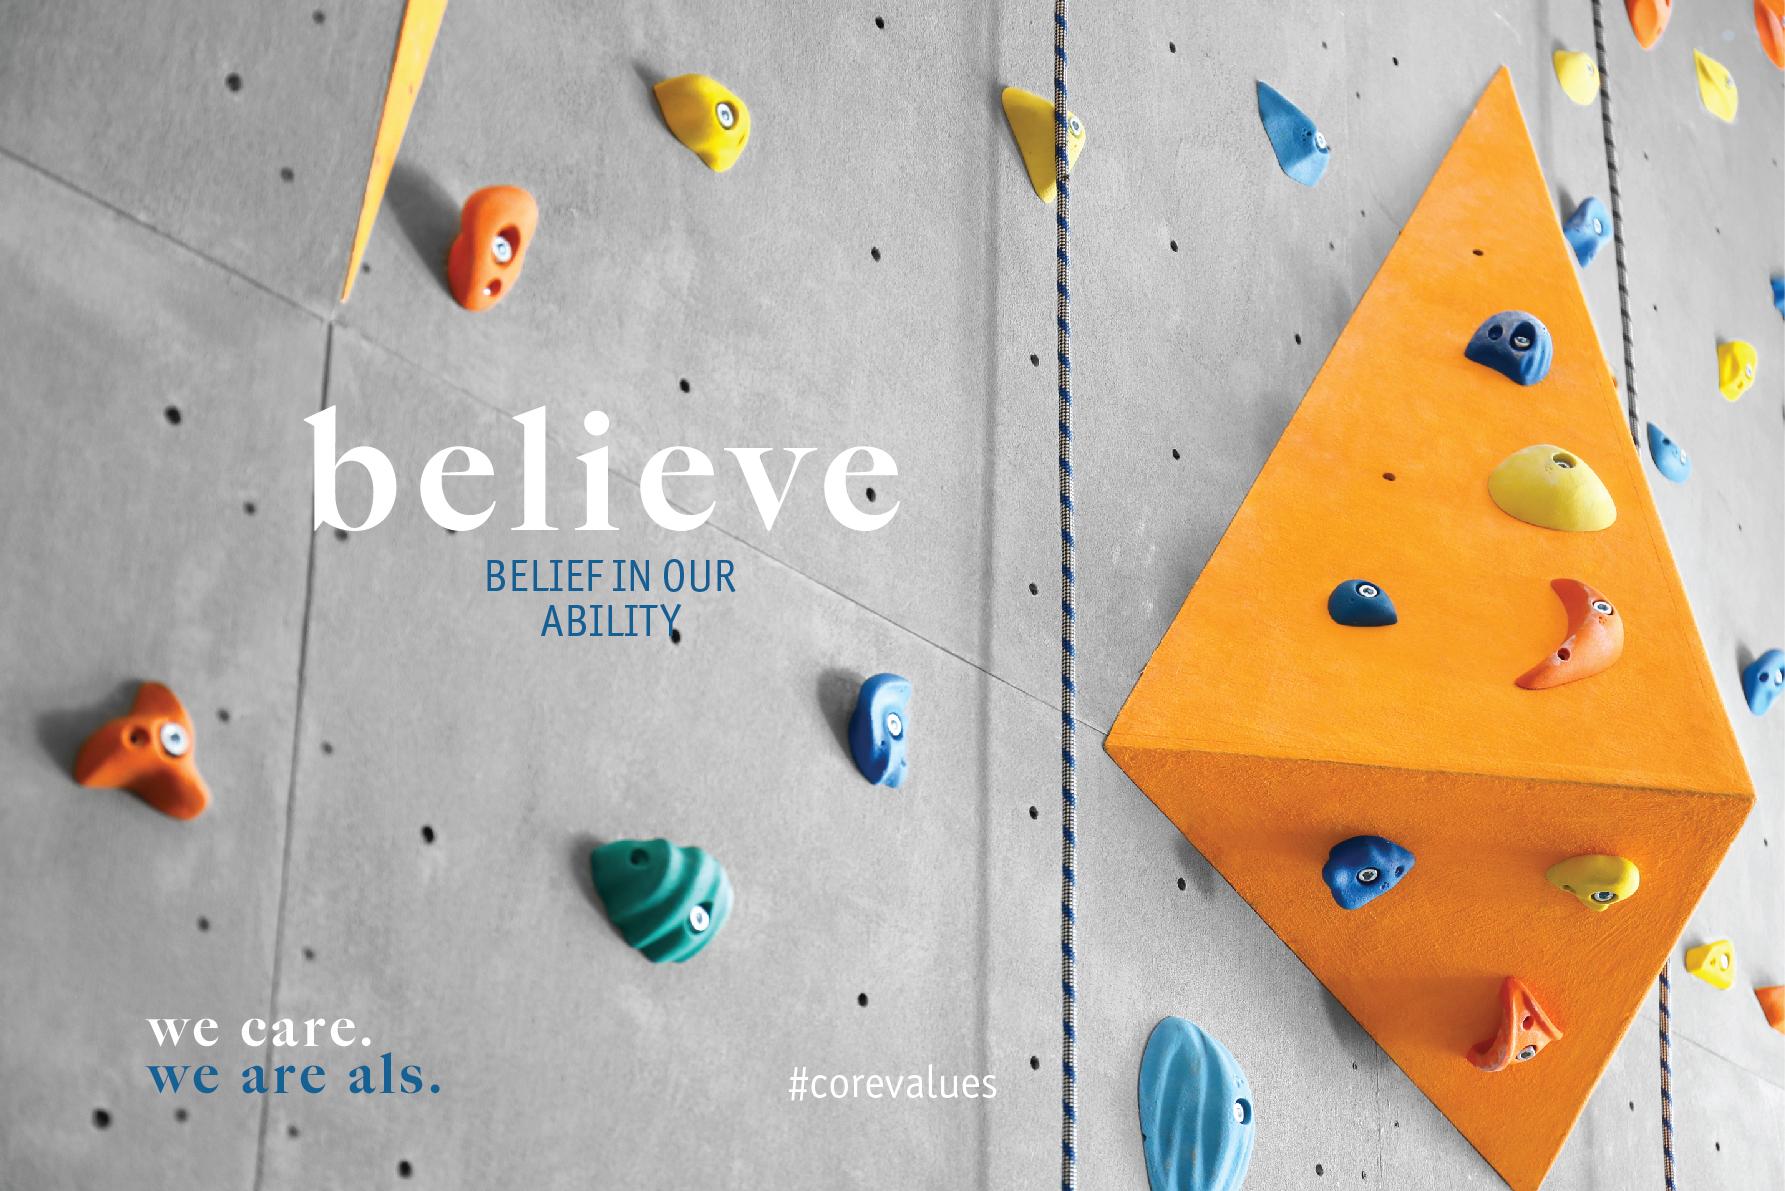 ALS core values Believe